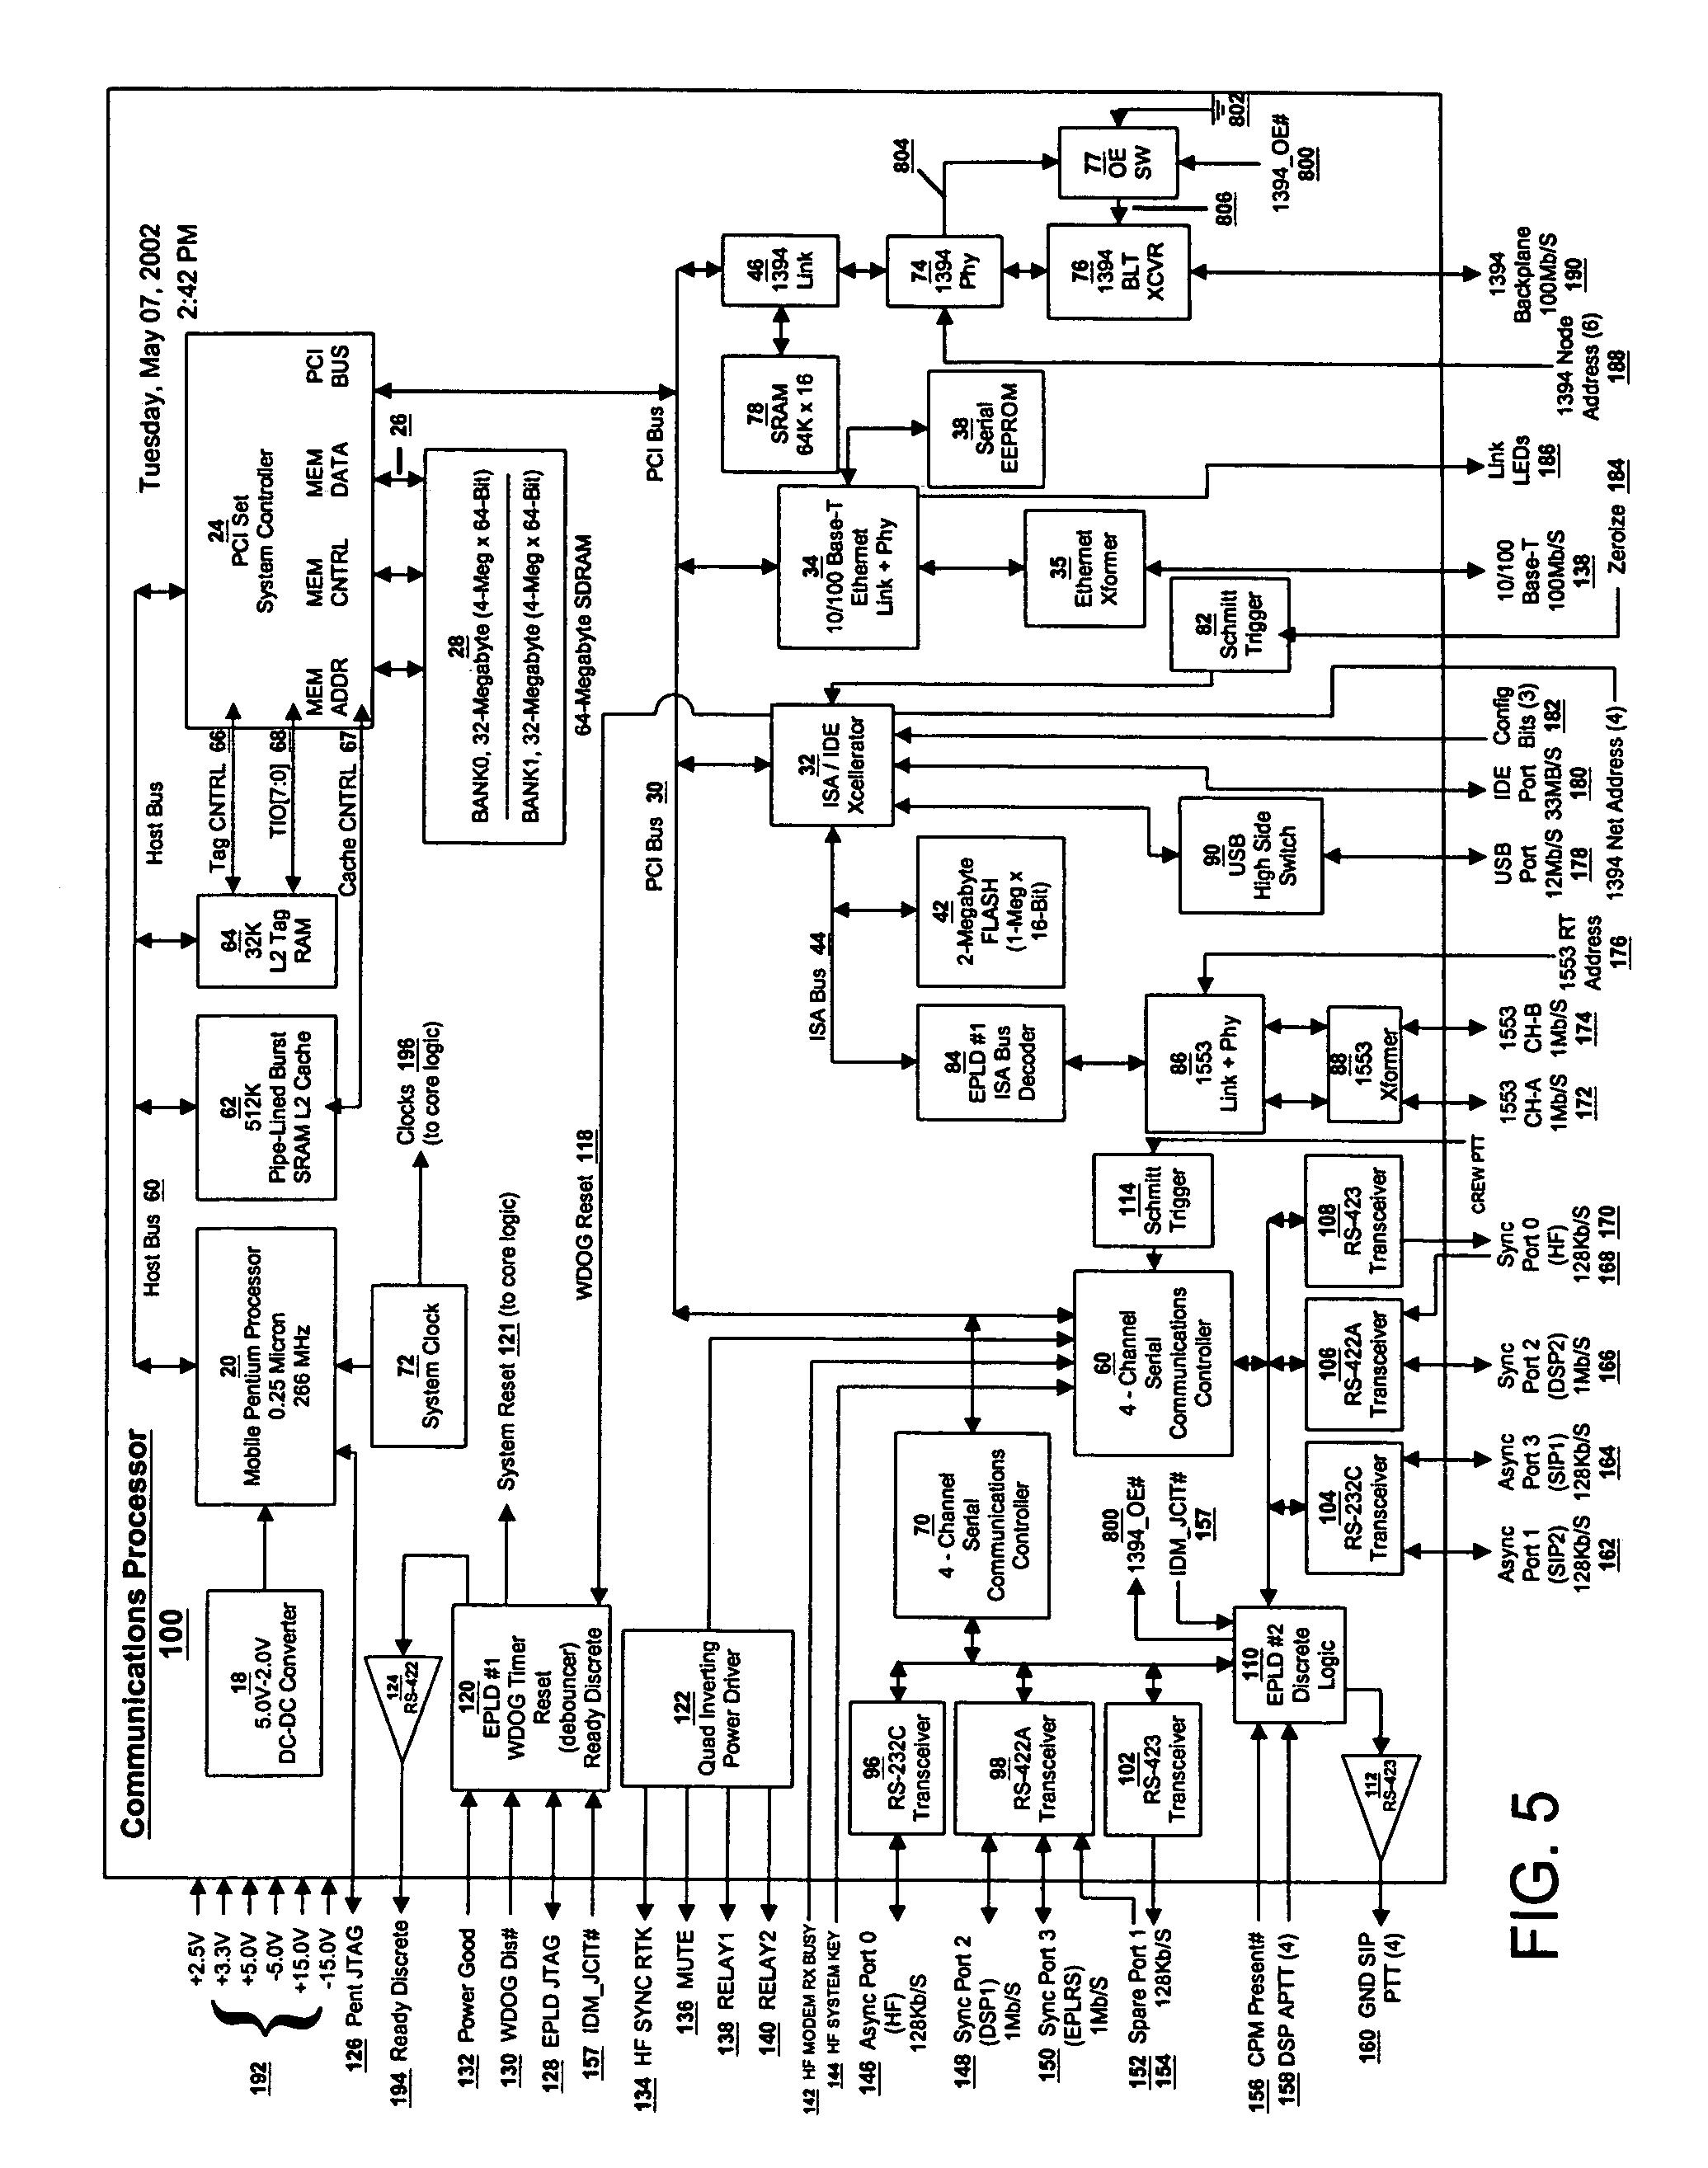 patent us7167945 - data modem